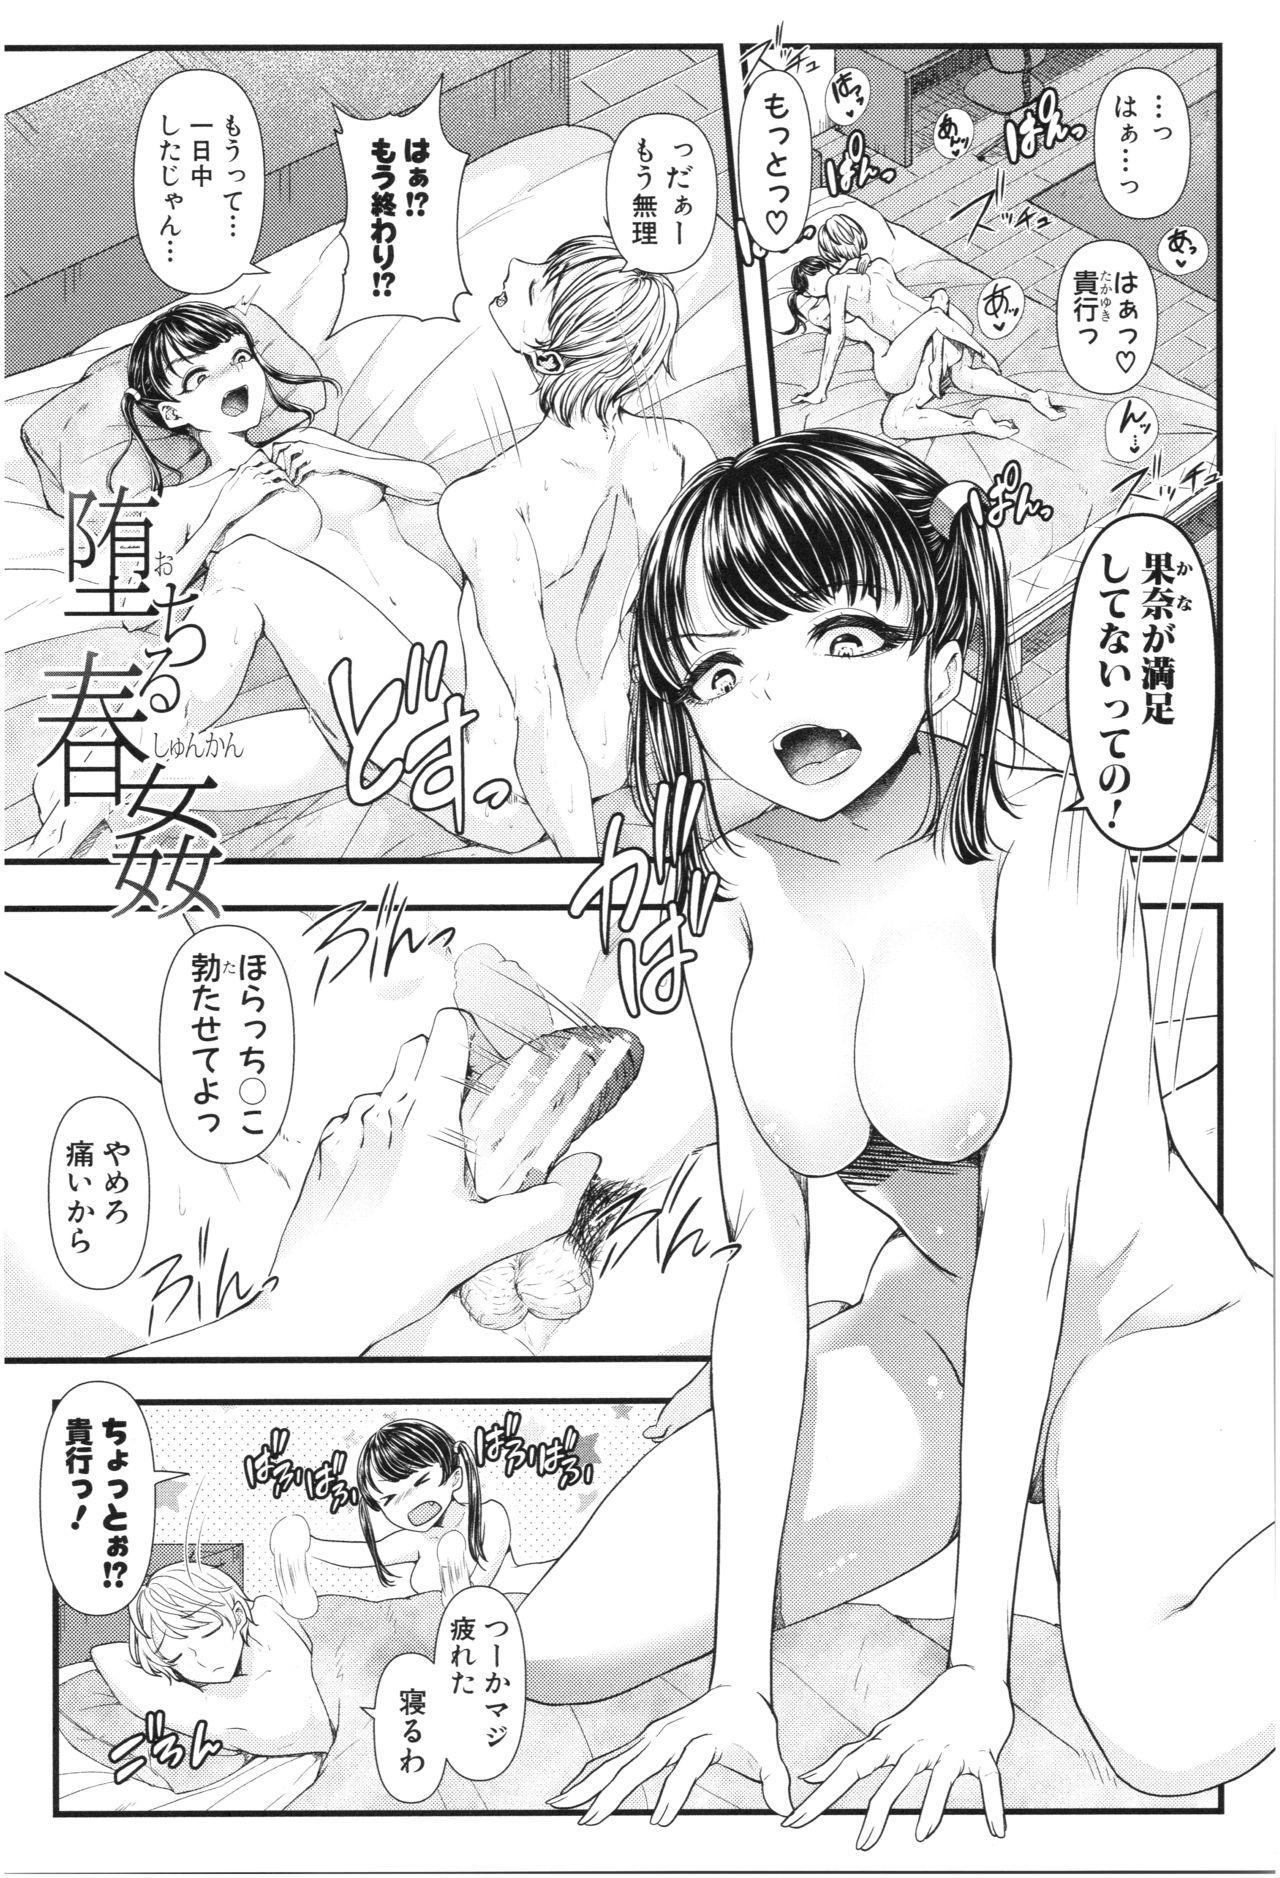 Sannenkan no Aoi Haru 129